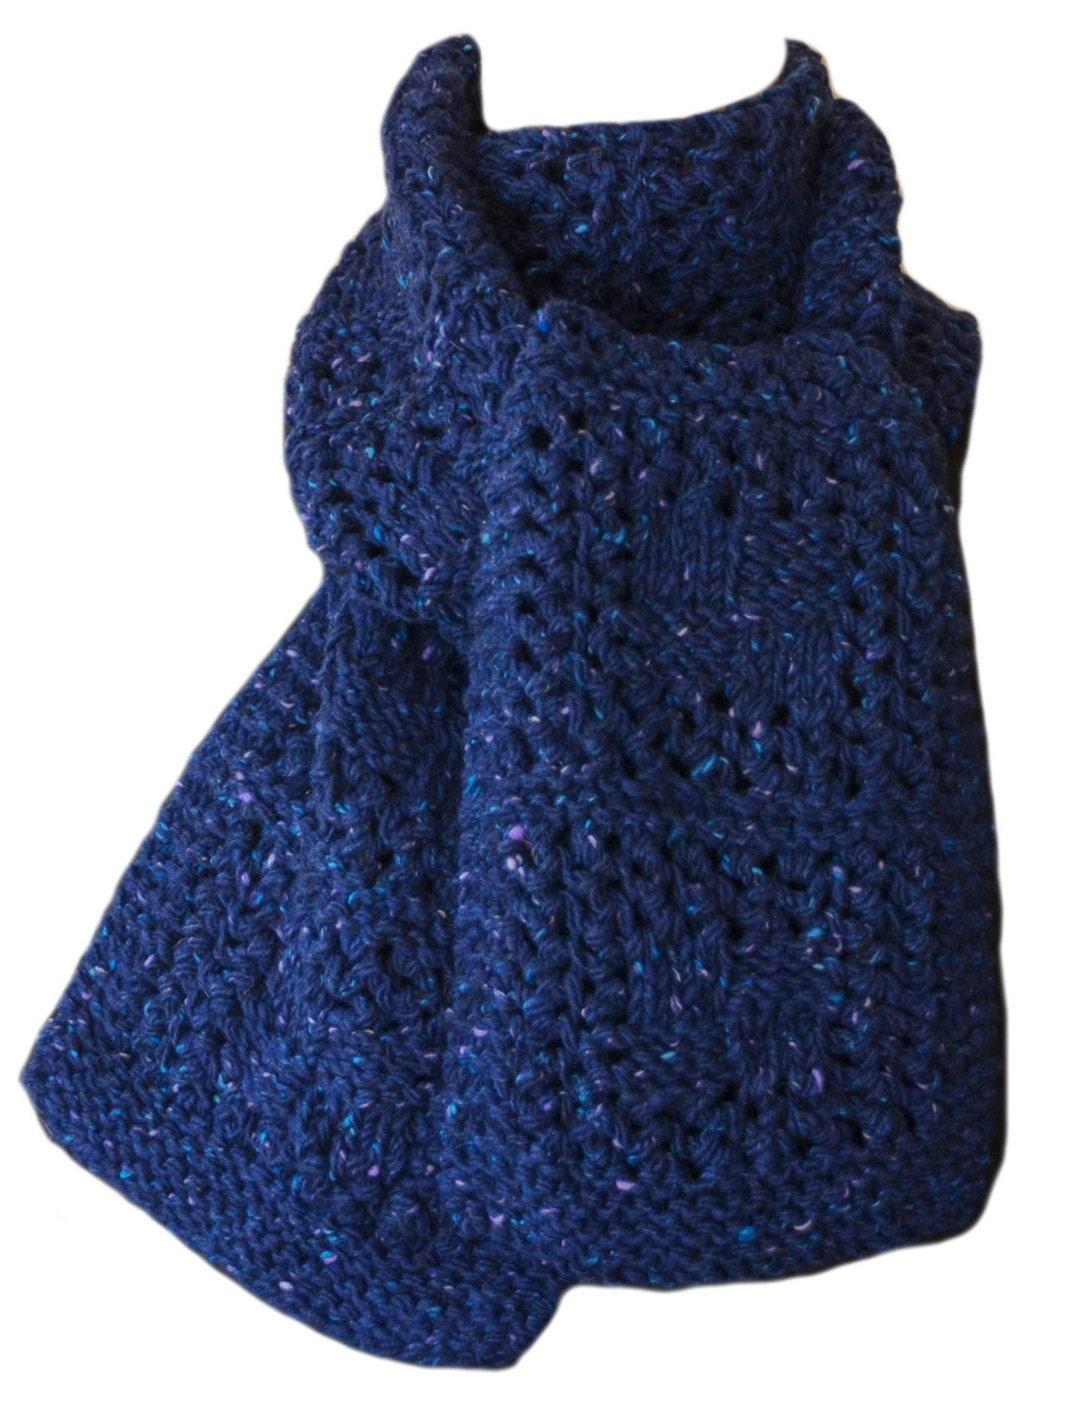 Hand Knit Scarf Blue Tweed Checkerboard Wool